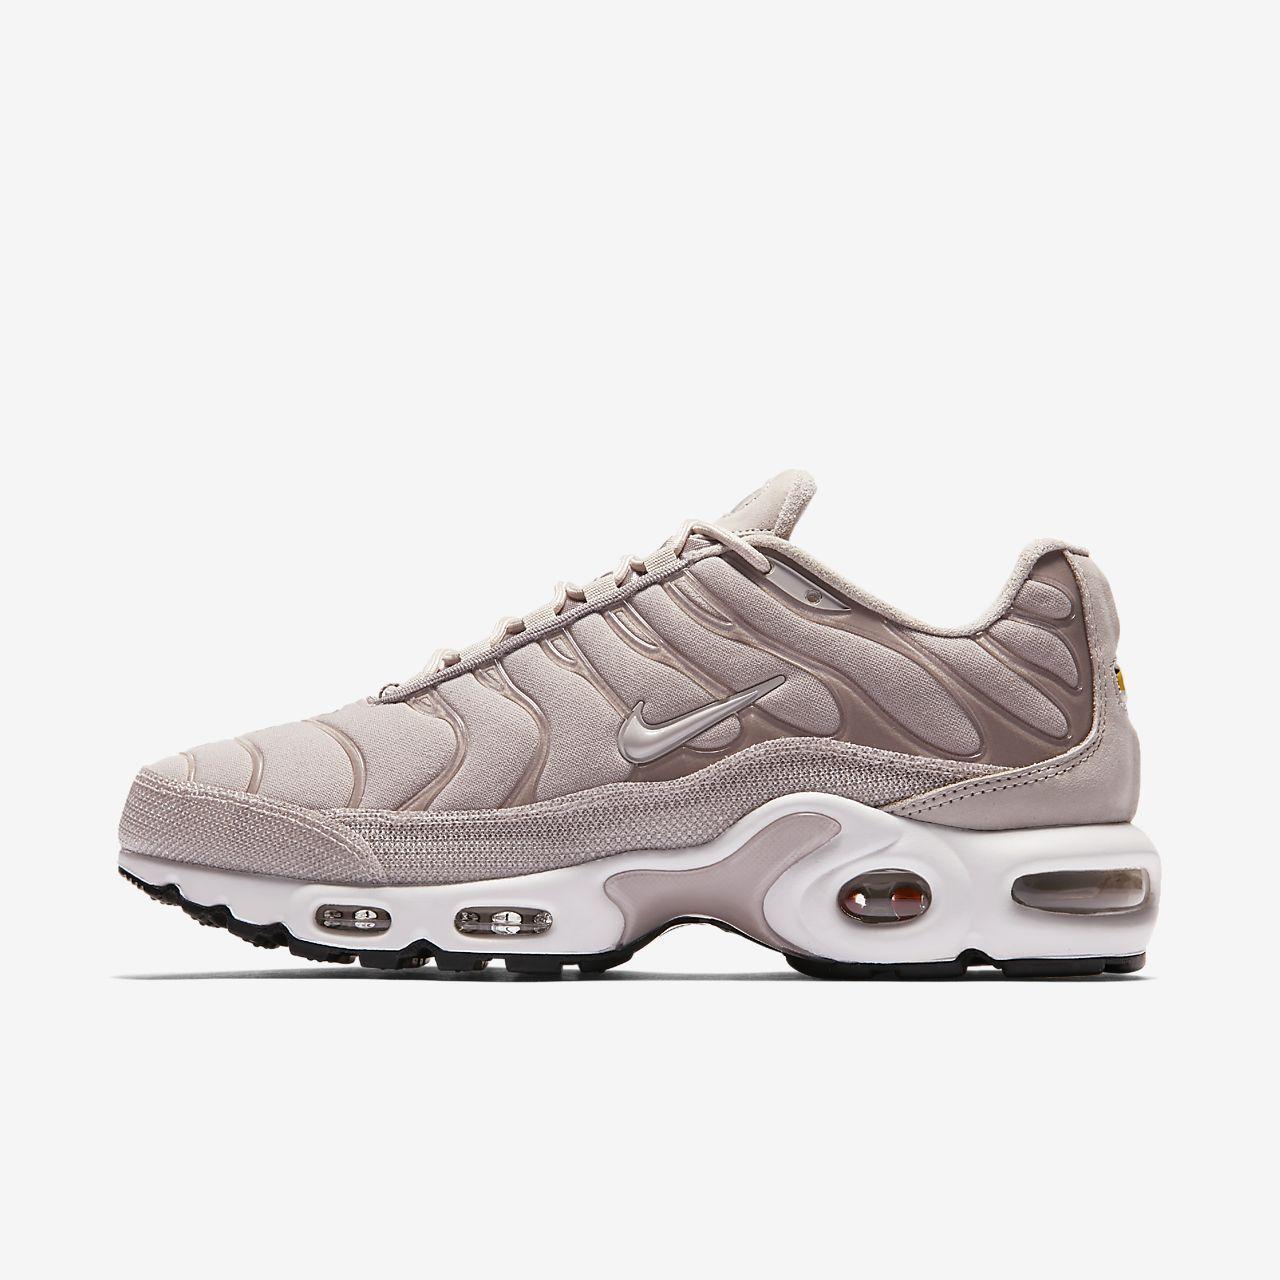 829580727972 Nike Air Max Plus Premium Women s Shoe